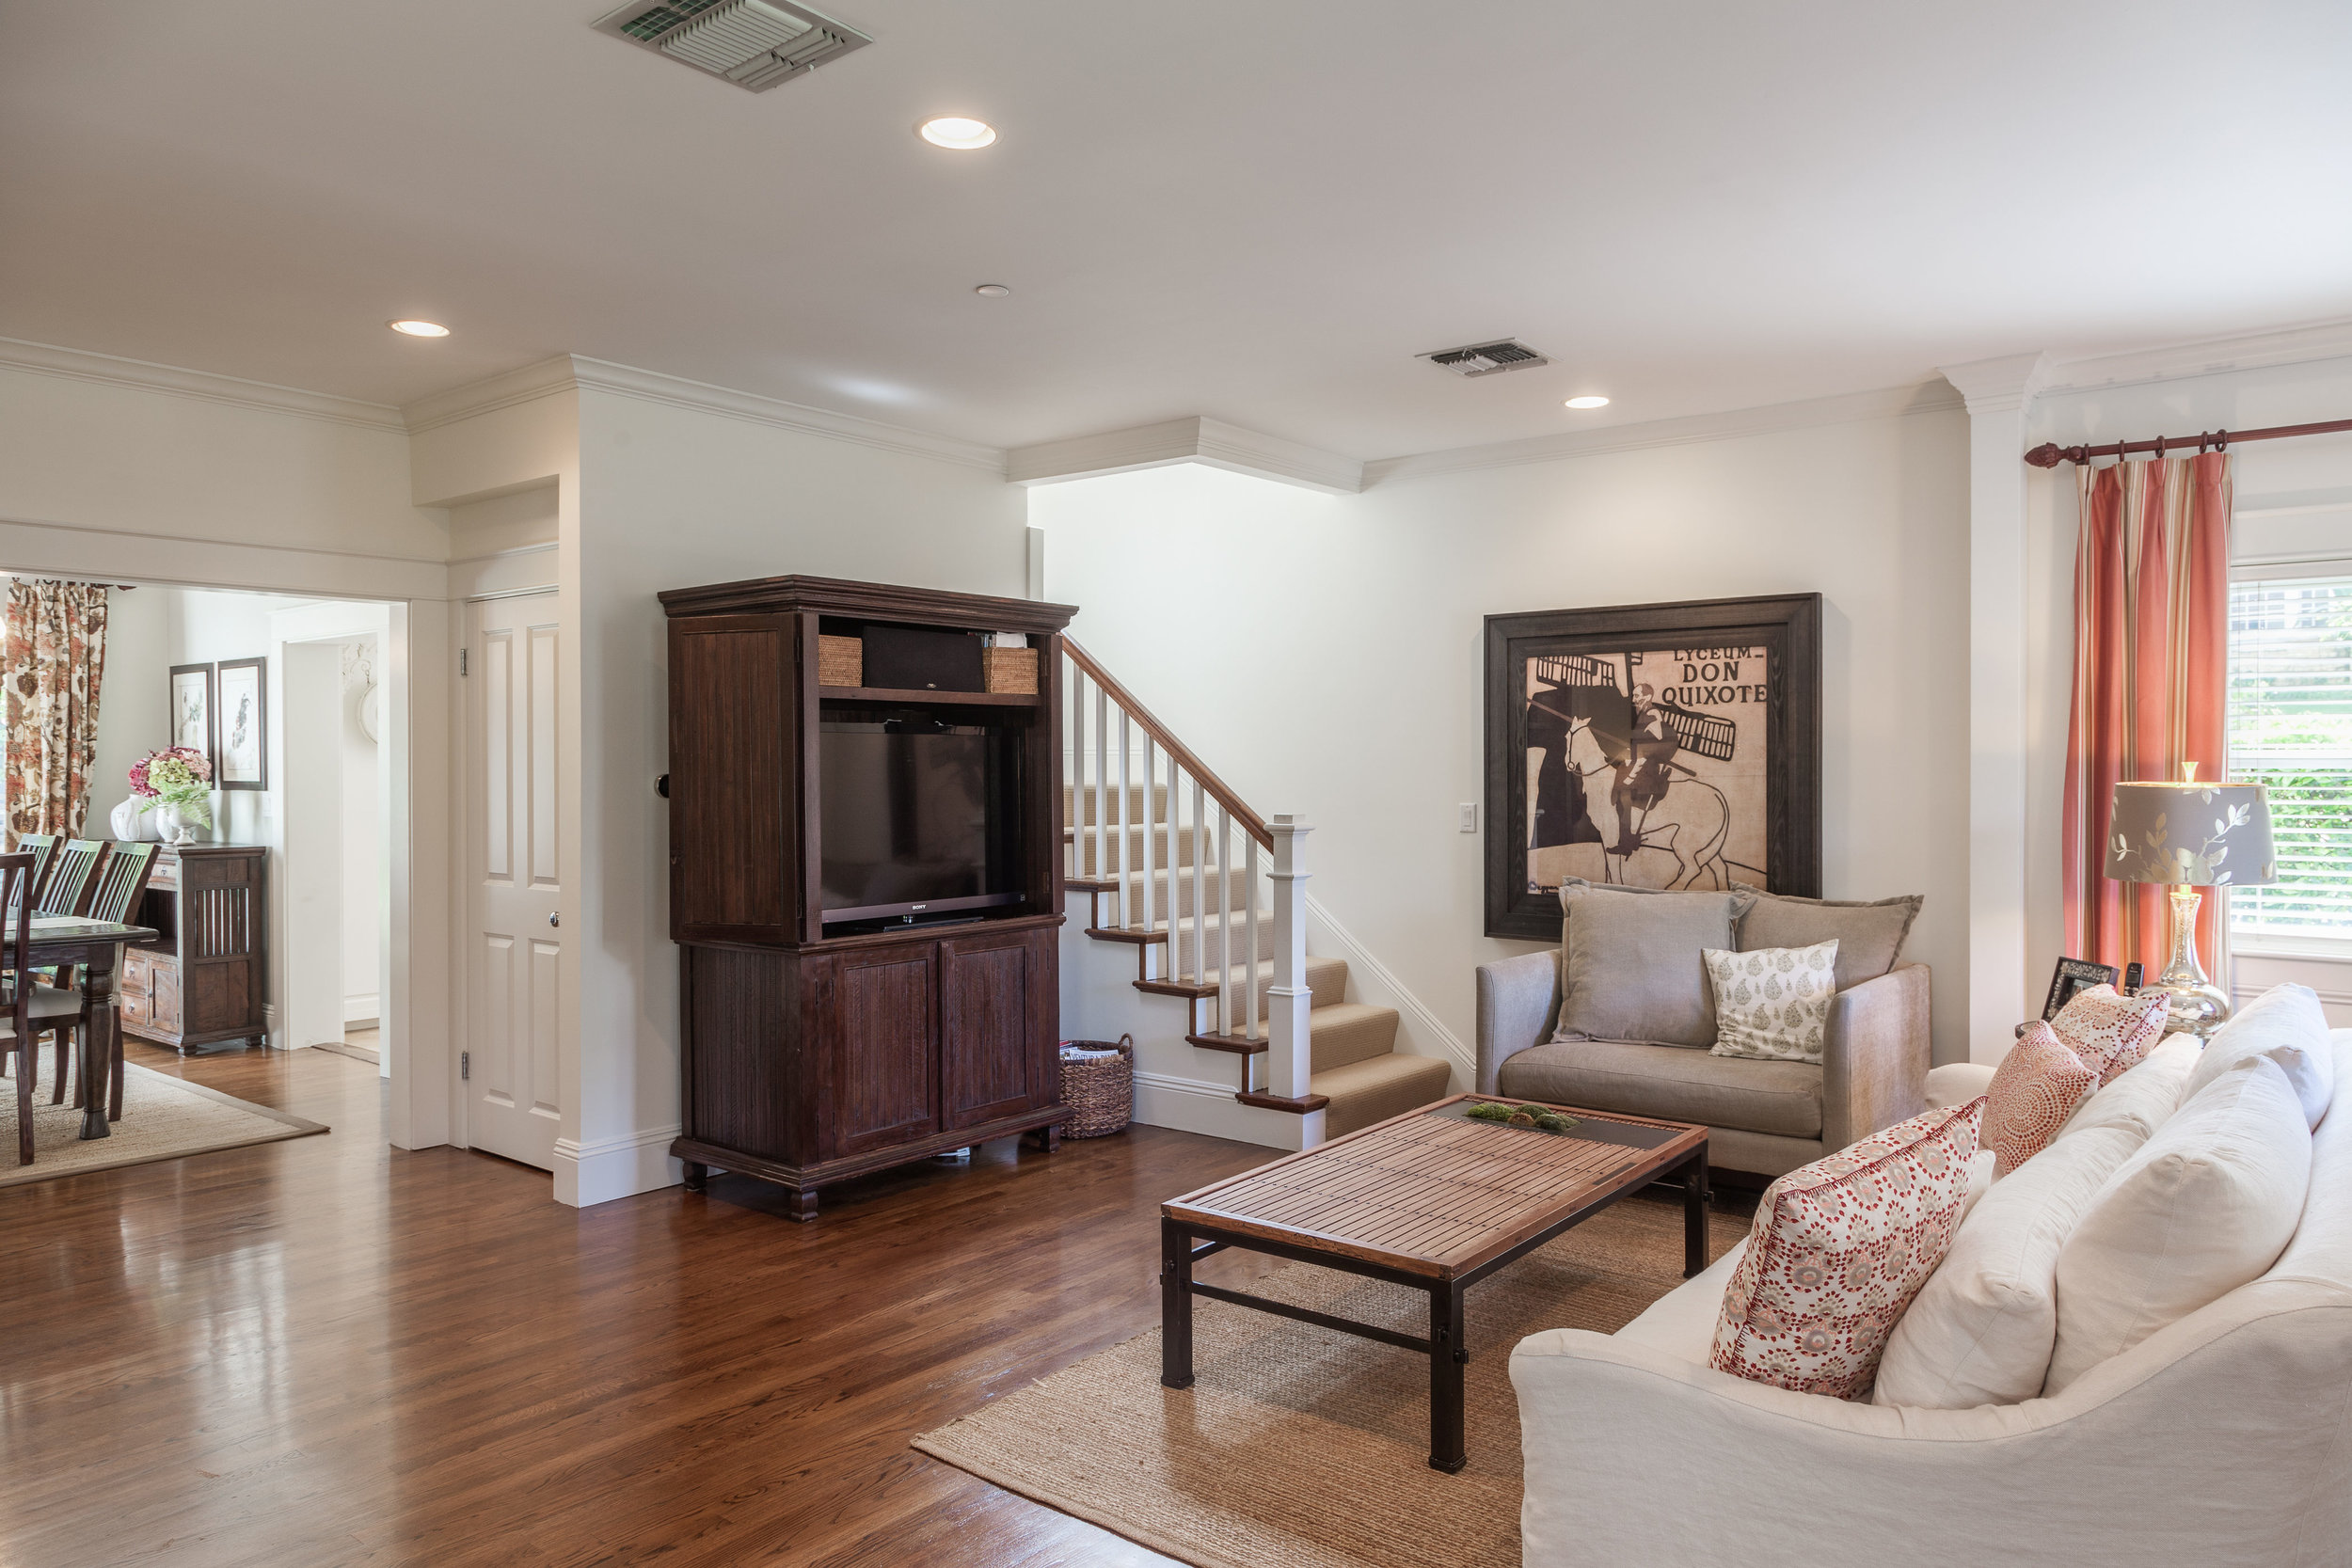 3163 La Suvida Dr Los Angeles-print-003-Living Room-4200x2800-300dpi.jpg